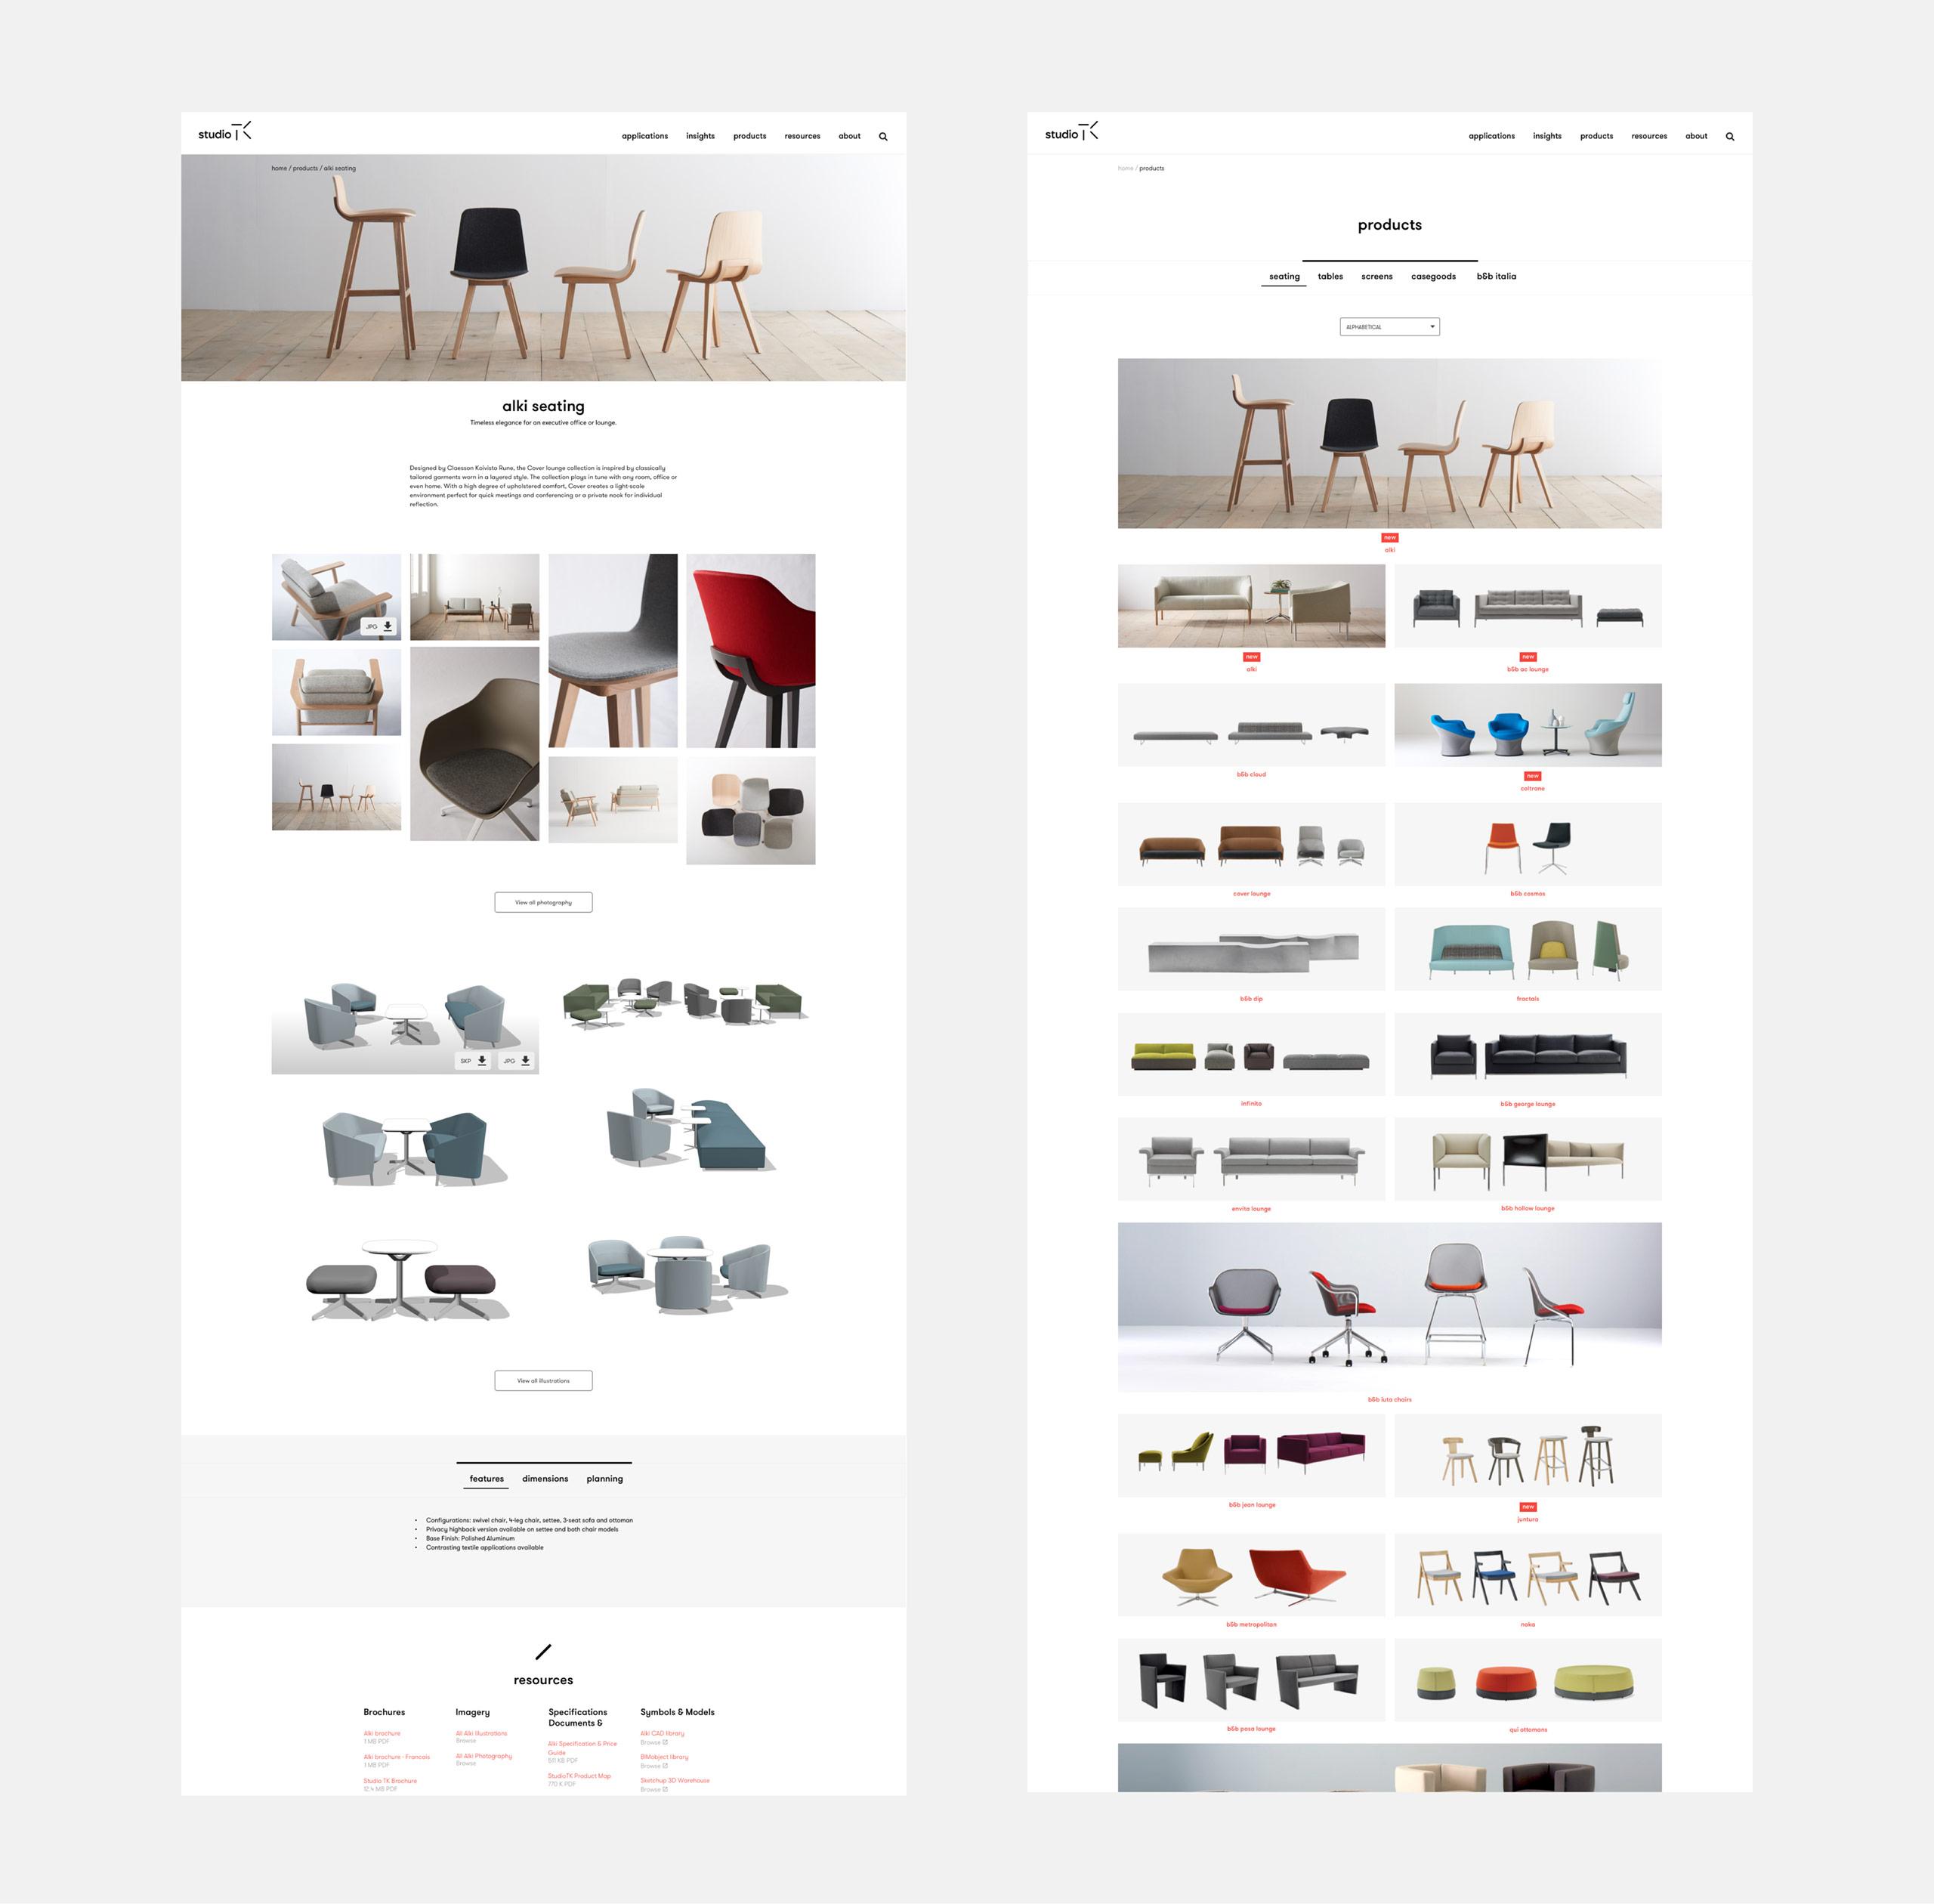 tolleson-case-study-StudioTK-interactive-12-1